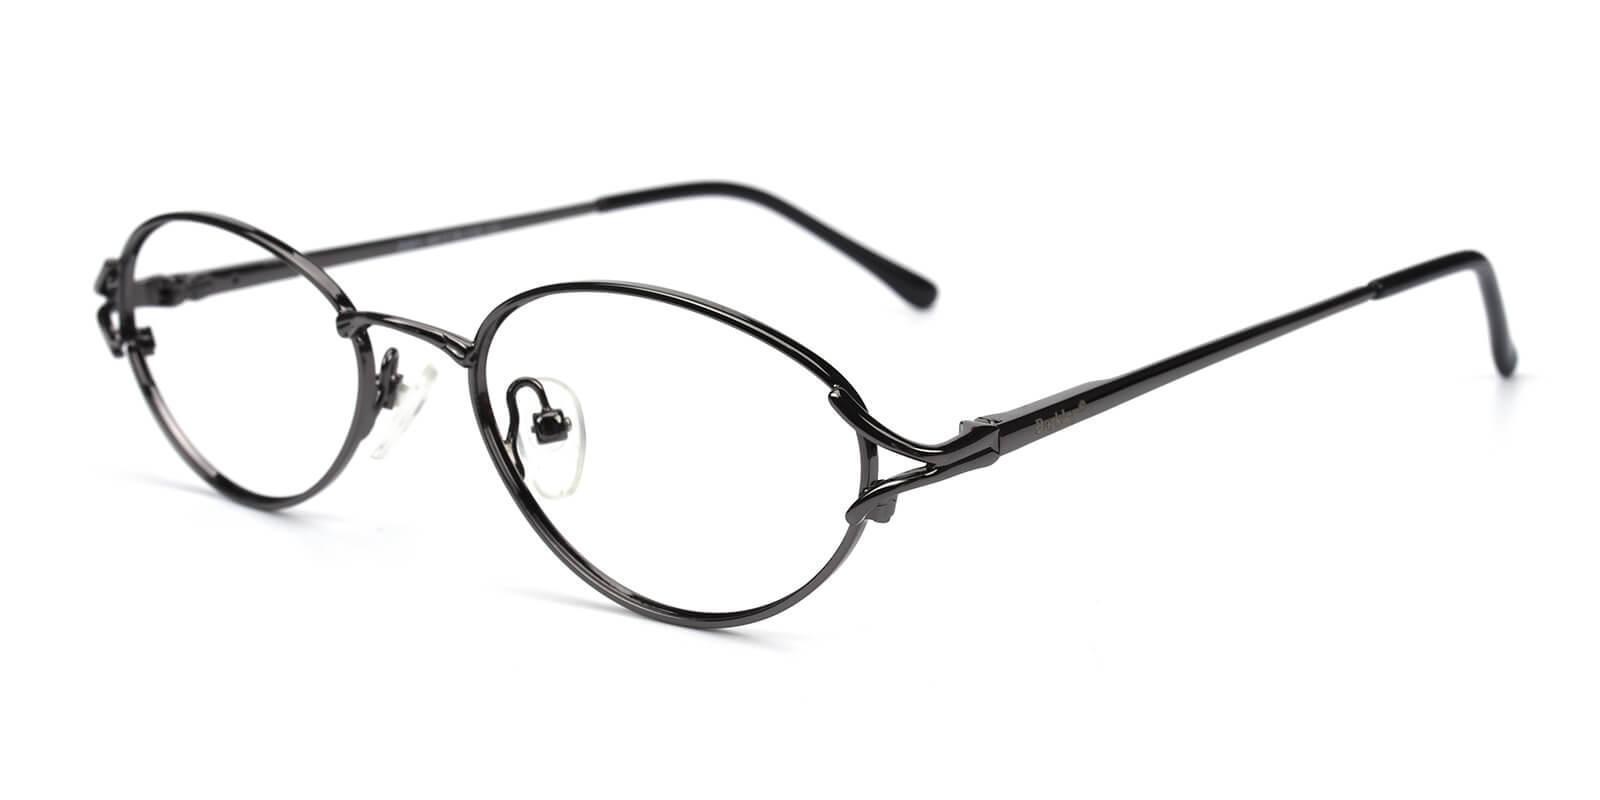 Victoria-Gun-Oval / Cat-Metal-Eyeglasses-additional1